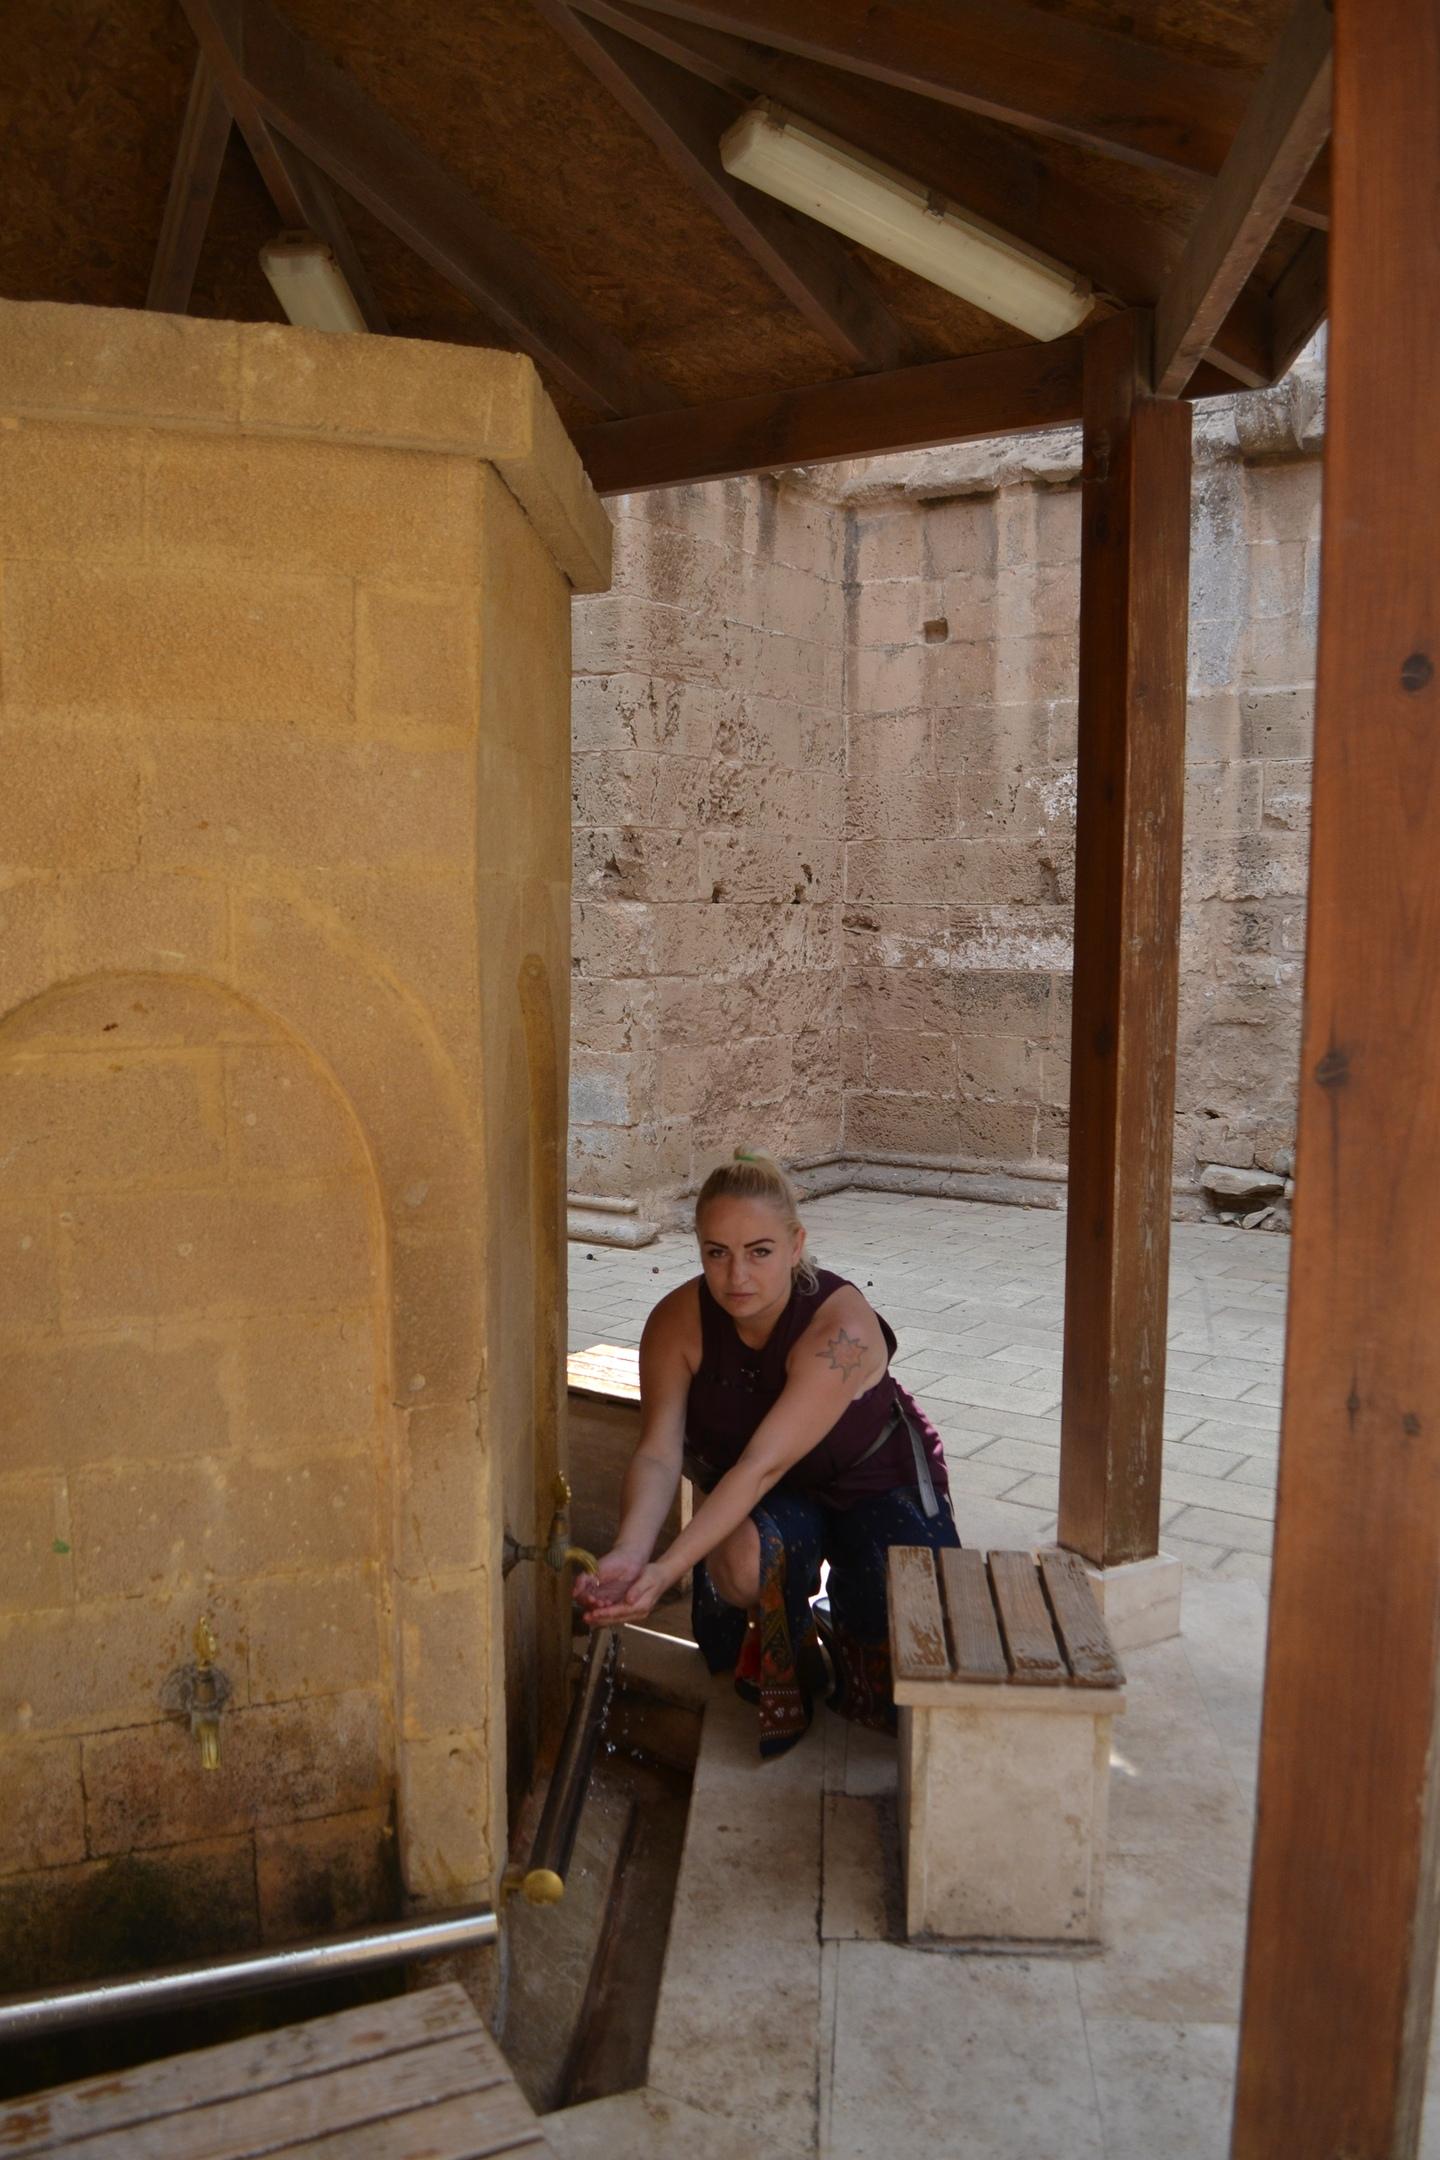 Елена Руденко (Валтея). Северный Кипр. Кериния и Фамагуста. (фото) - Страница 6 O7mCa9-mCwQ